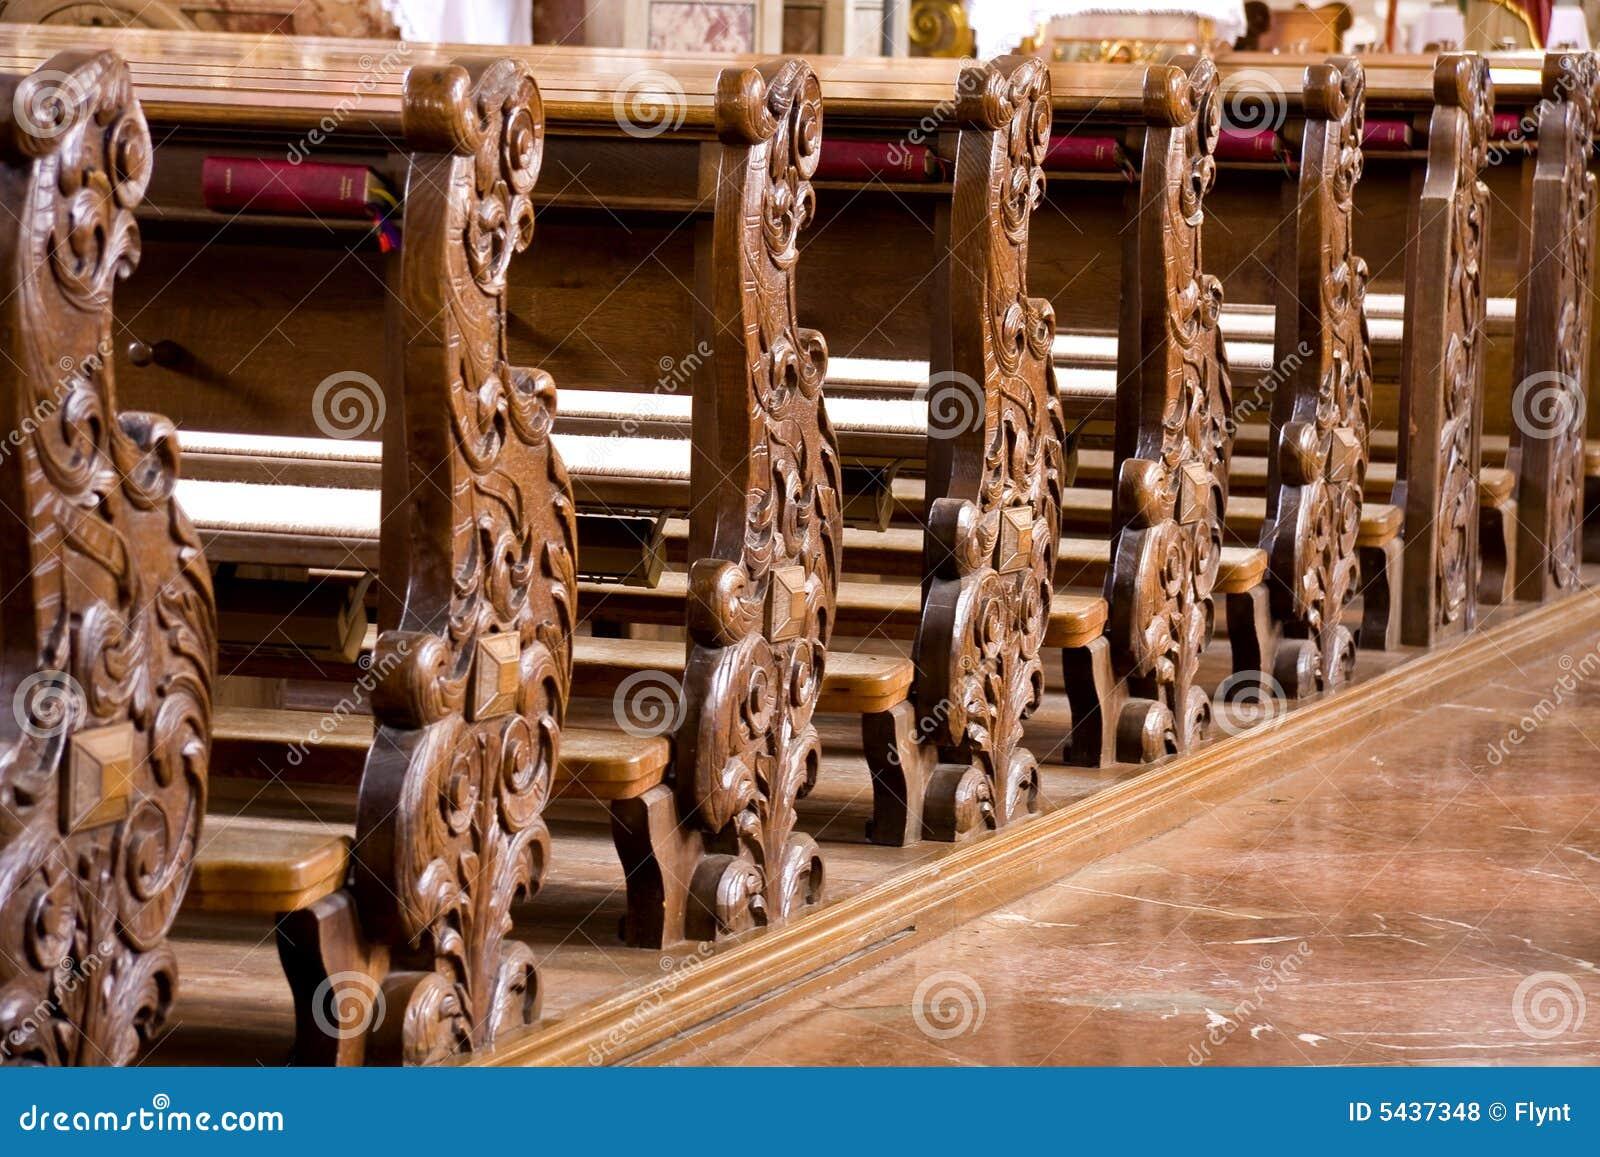 Bancos Da Igreja Fotos de Stock Royalty Free Imagem: 5437348 #321709 1300x957